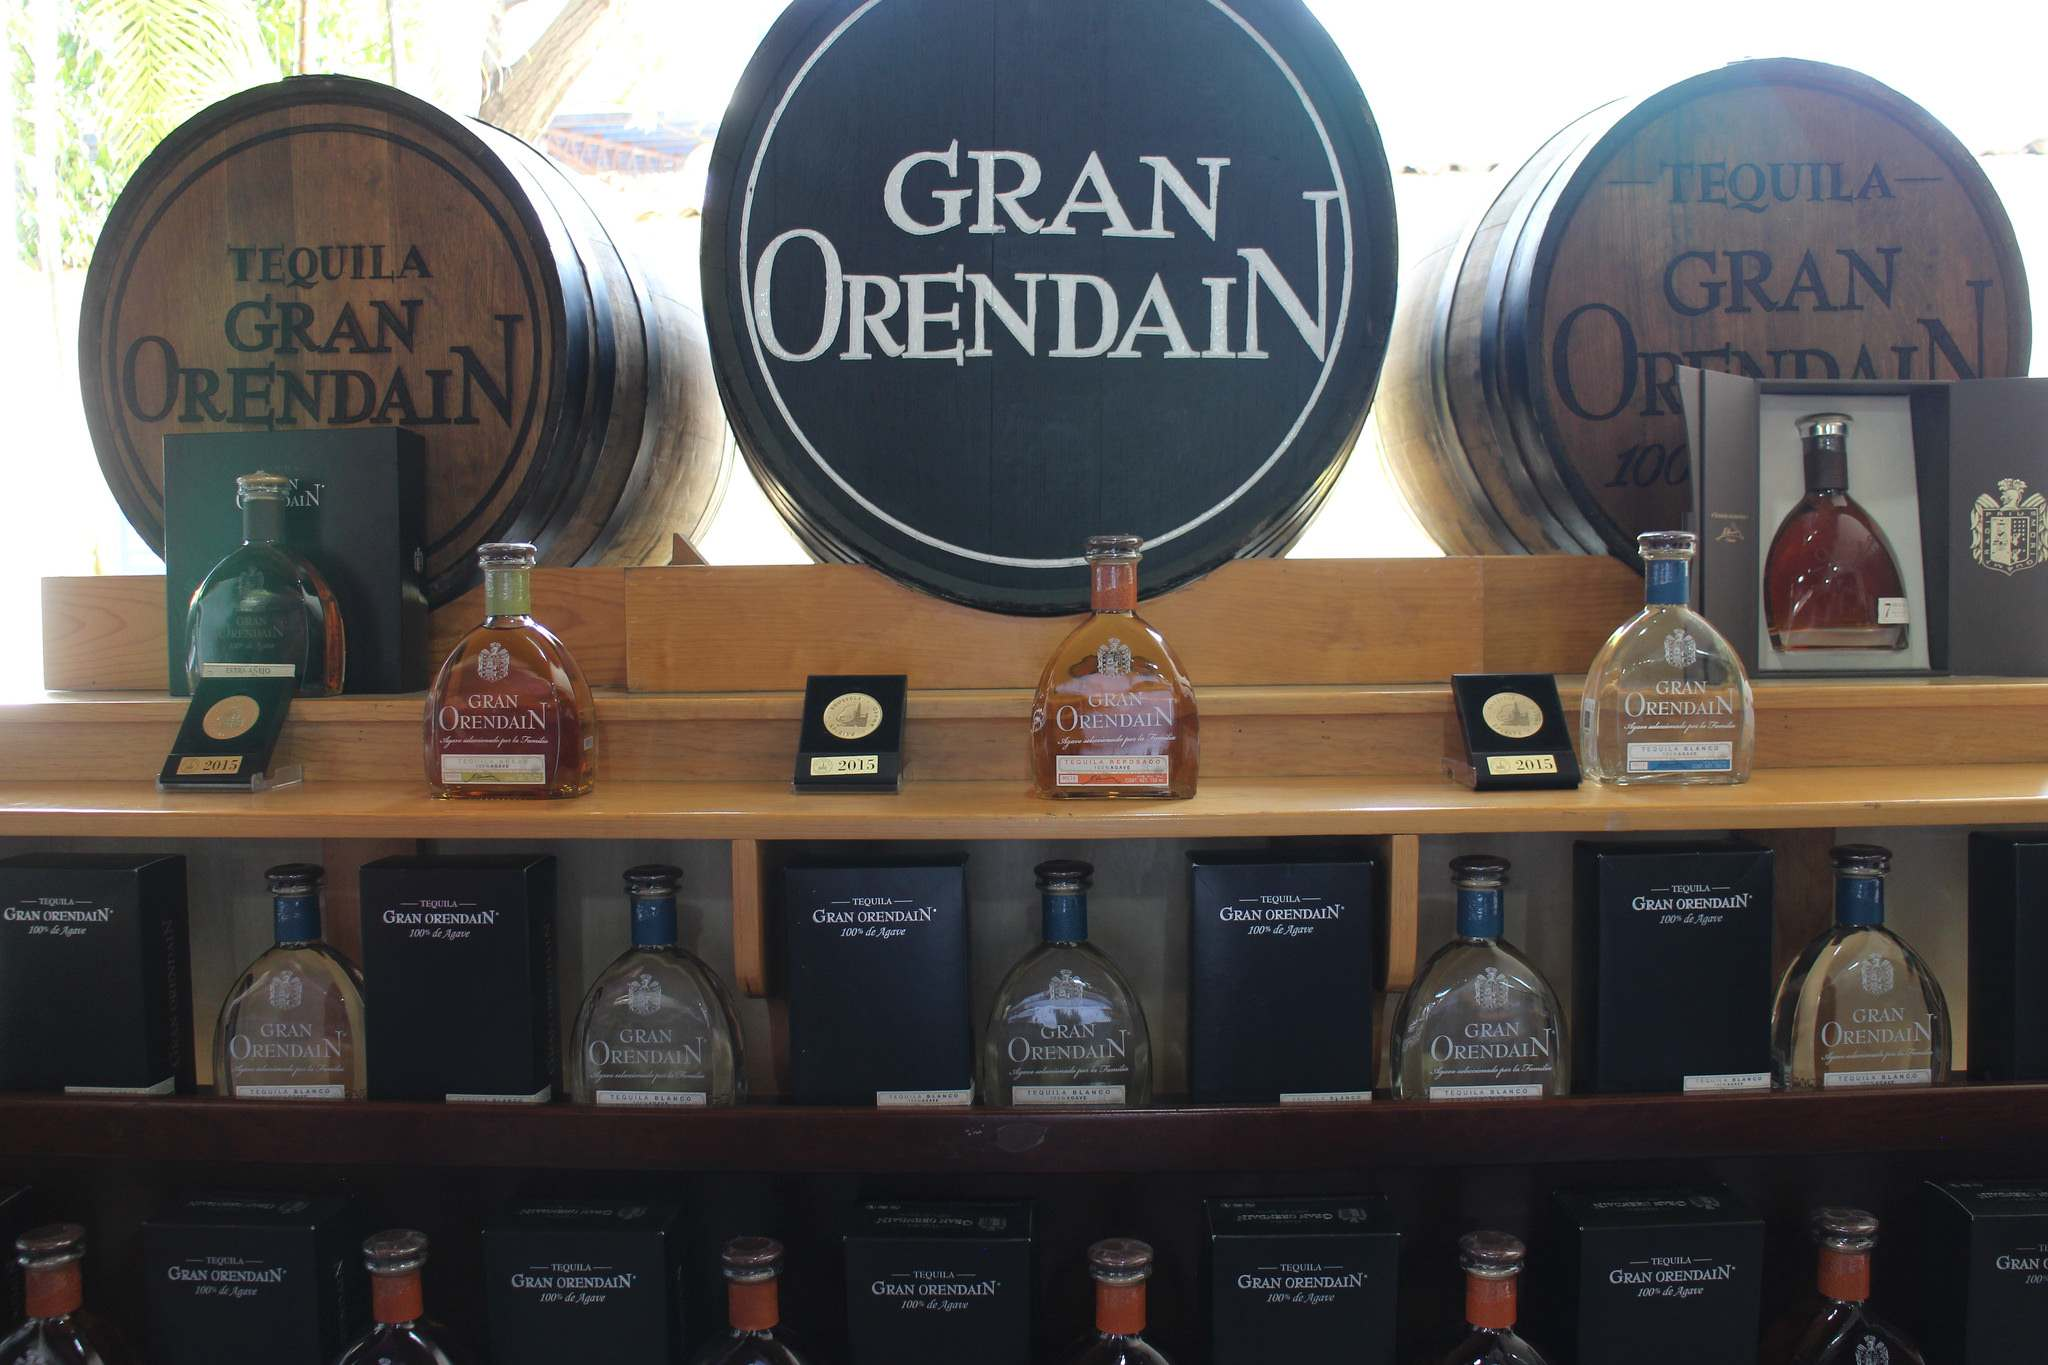 tequila orendain Tequila Orendain Tour   Mexicos Best Tequila